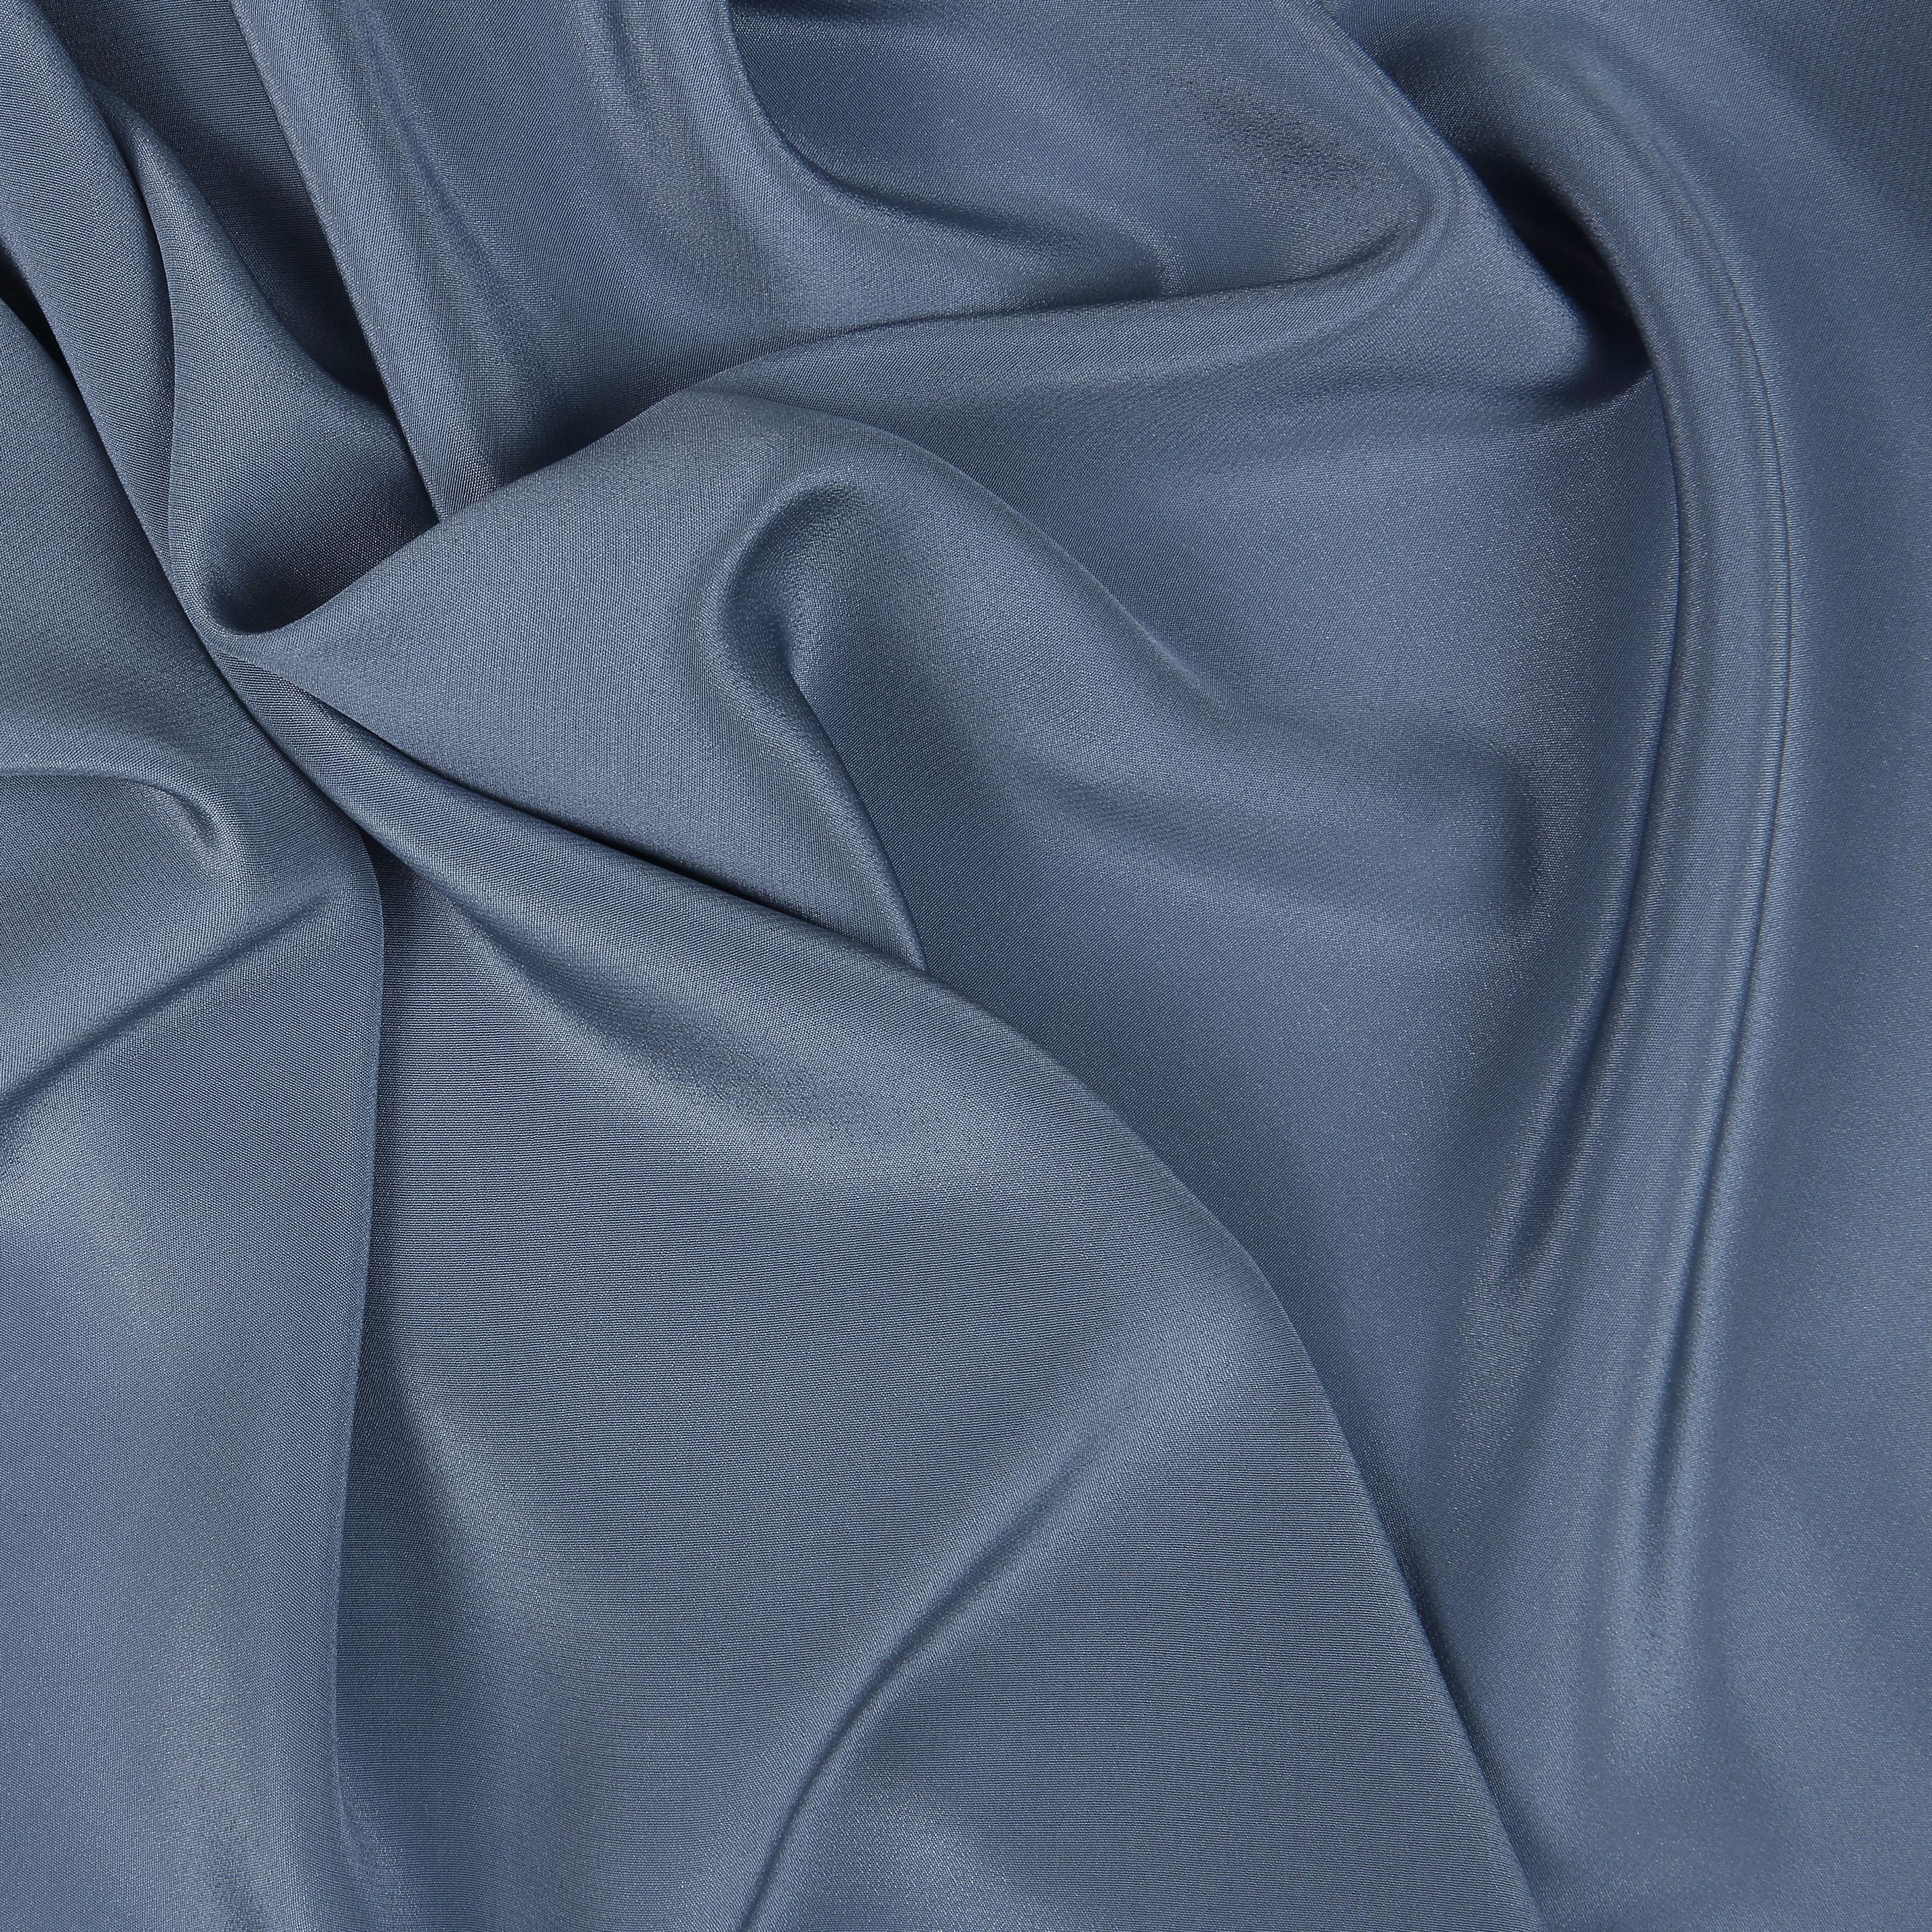 silk crepe de chine smoky blue bloomsbury square dressmaking fabric. Black Bedroom Furniture Sets. Home Design Ideas